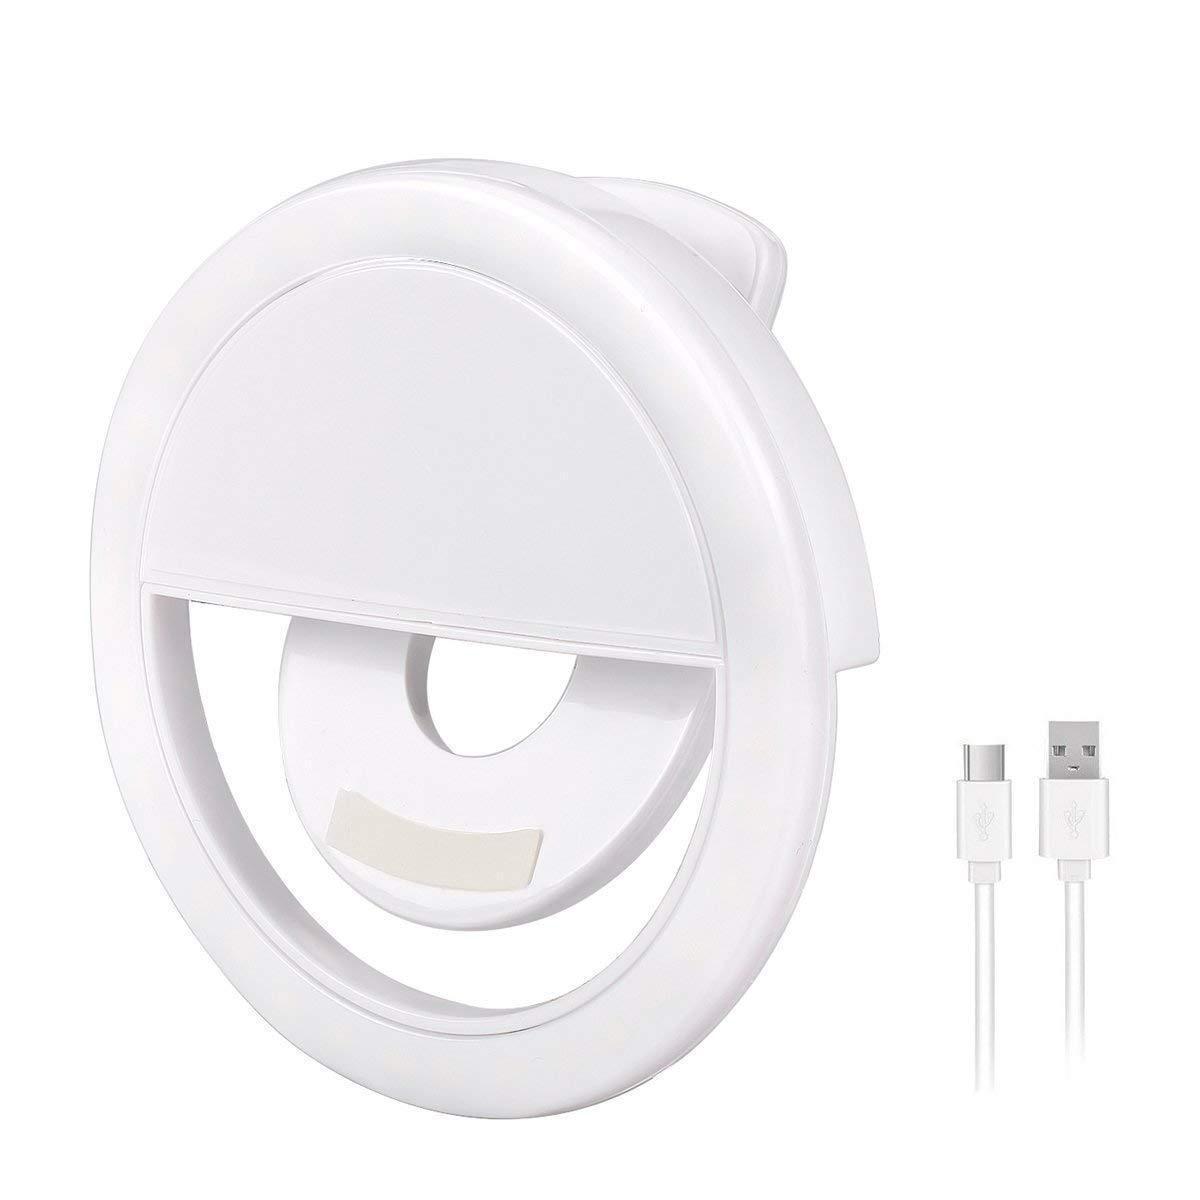 Селфи кольцо на акуммуляторе Selfie Ring Light RK-12